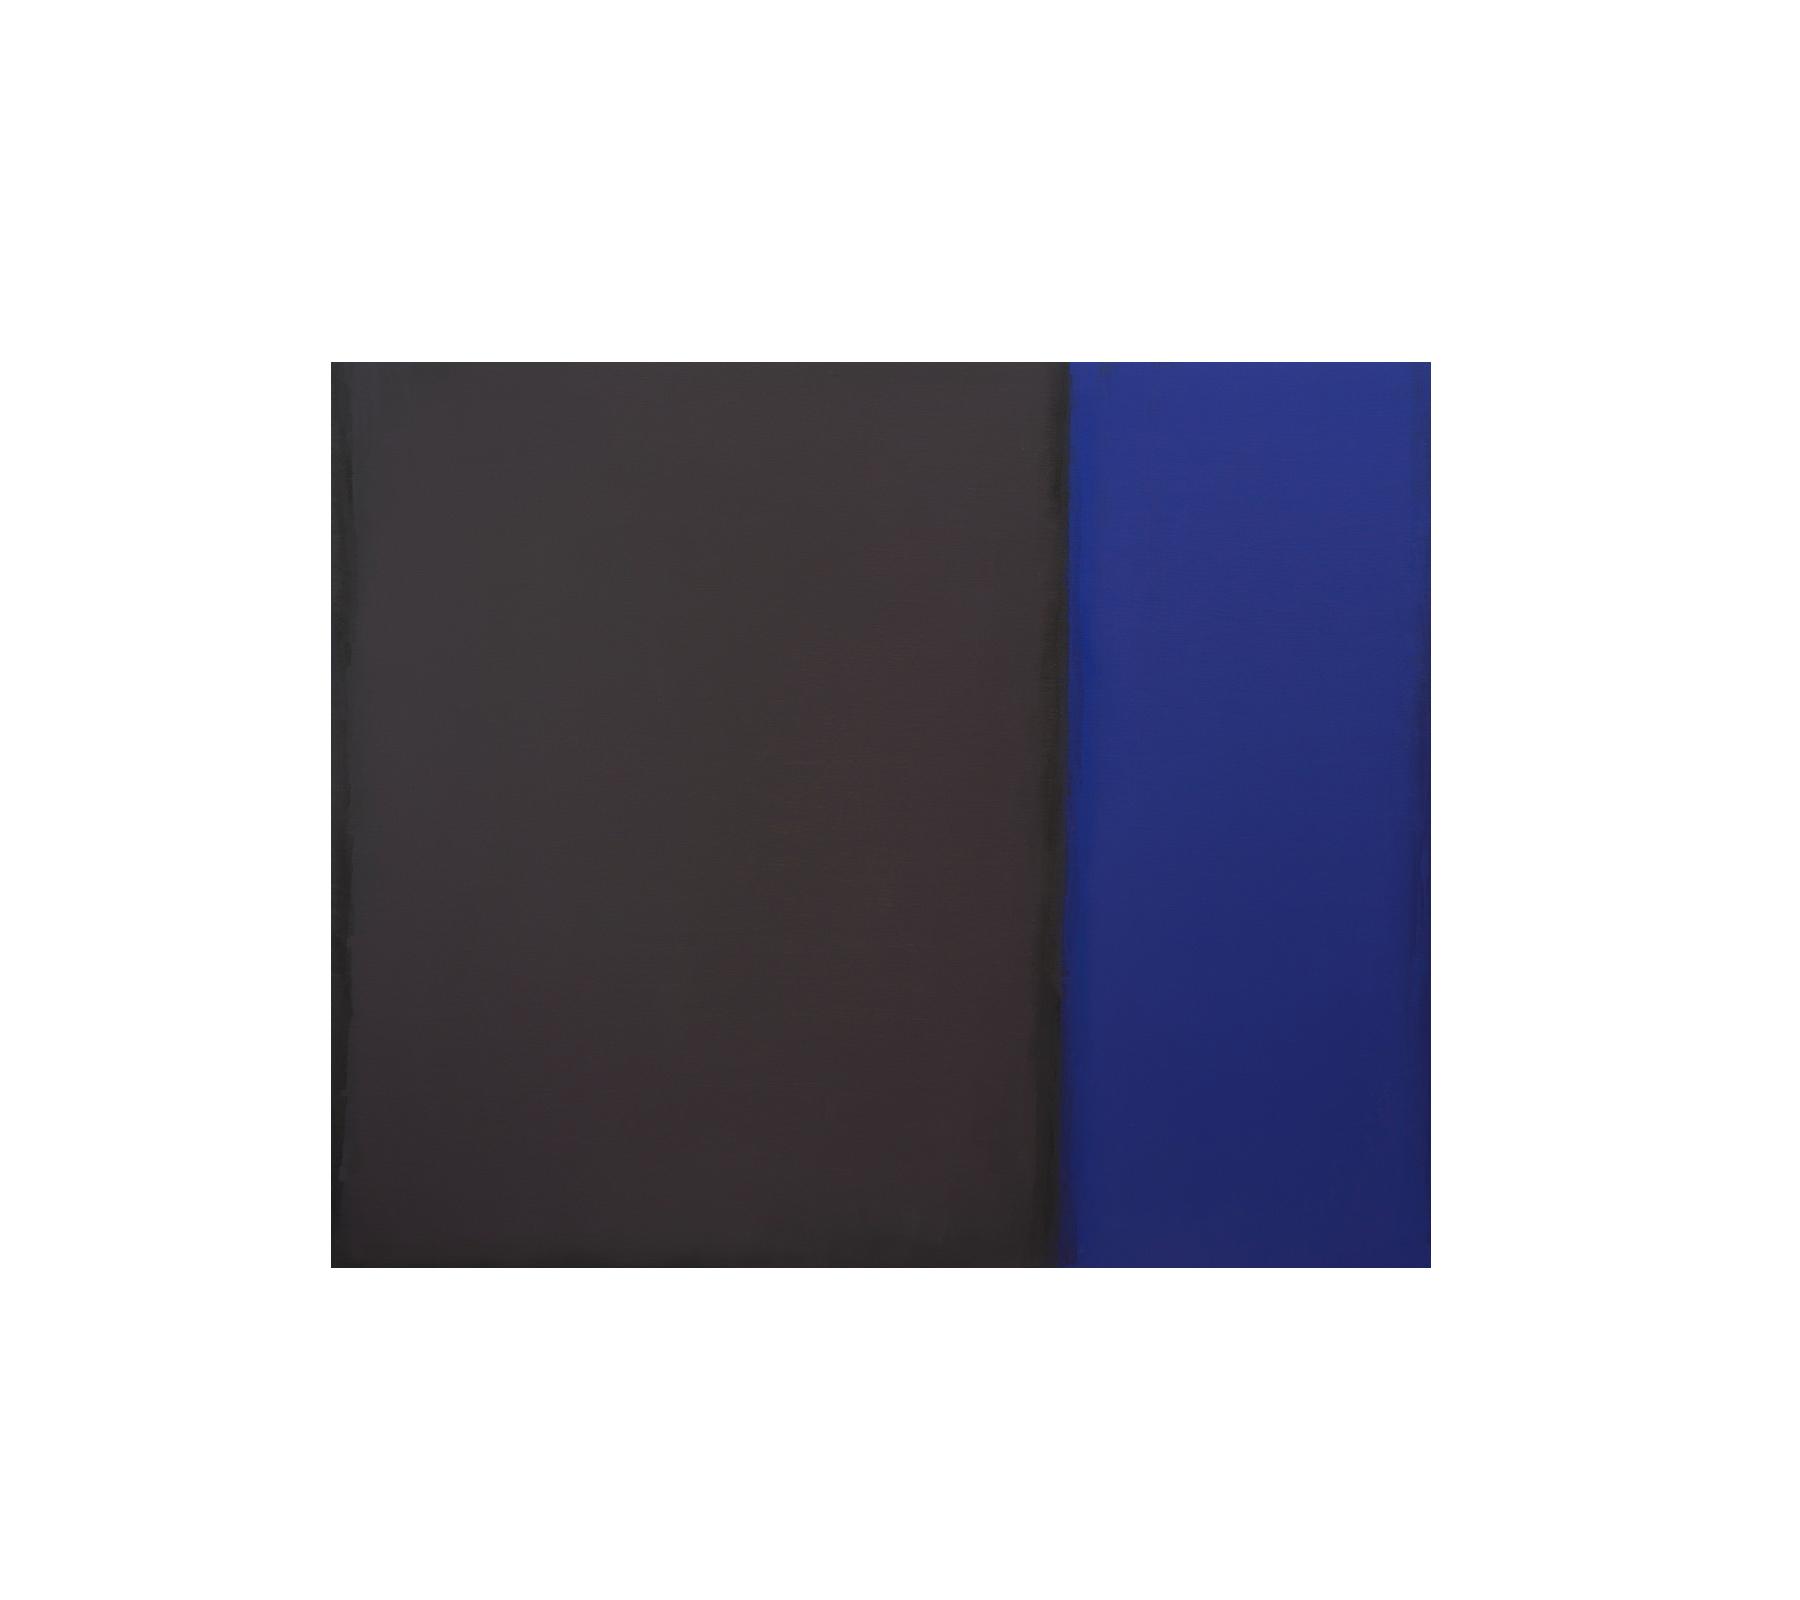 Untitled 2018 140x170cm